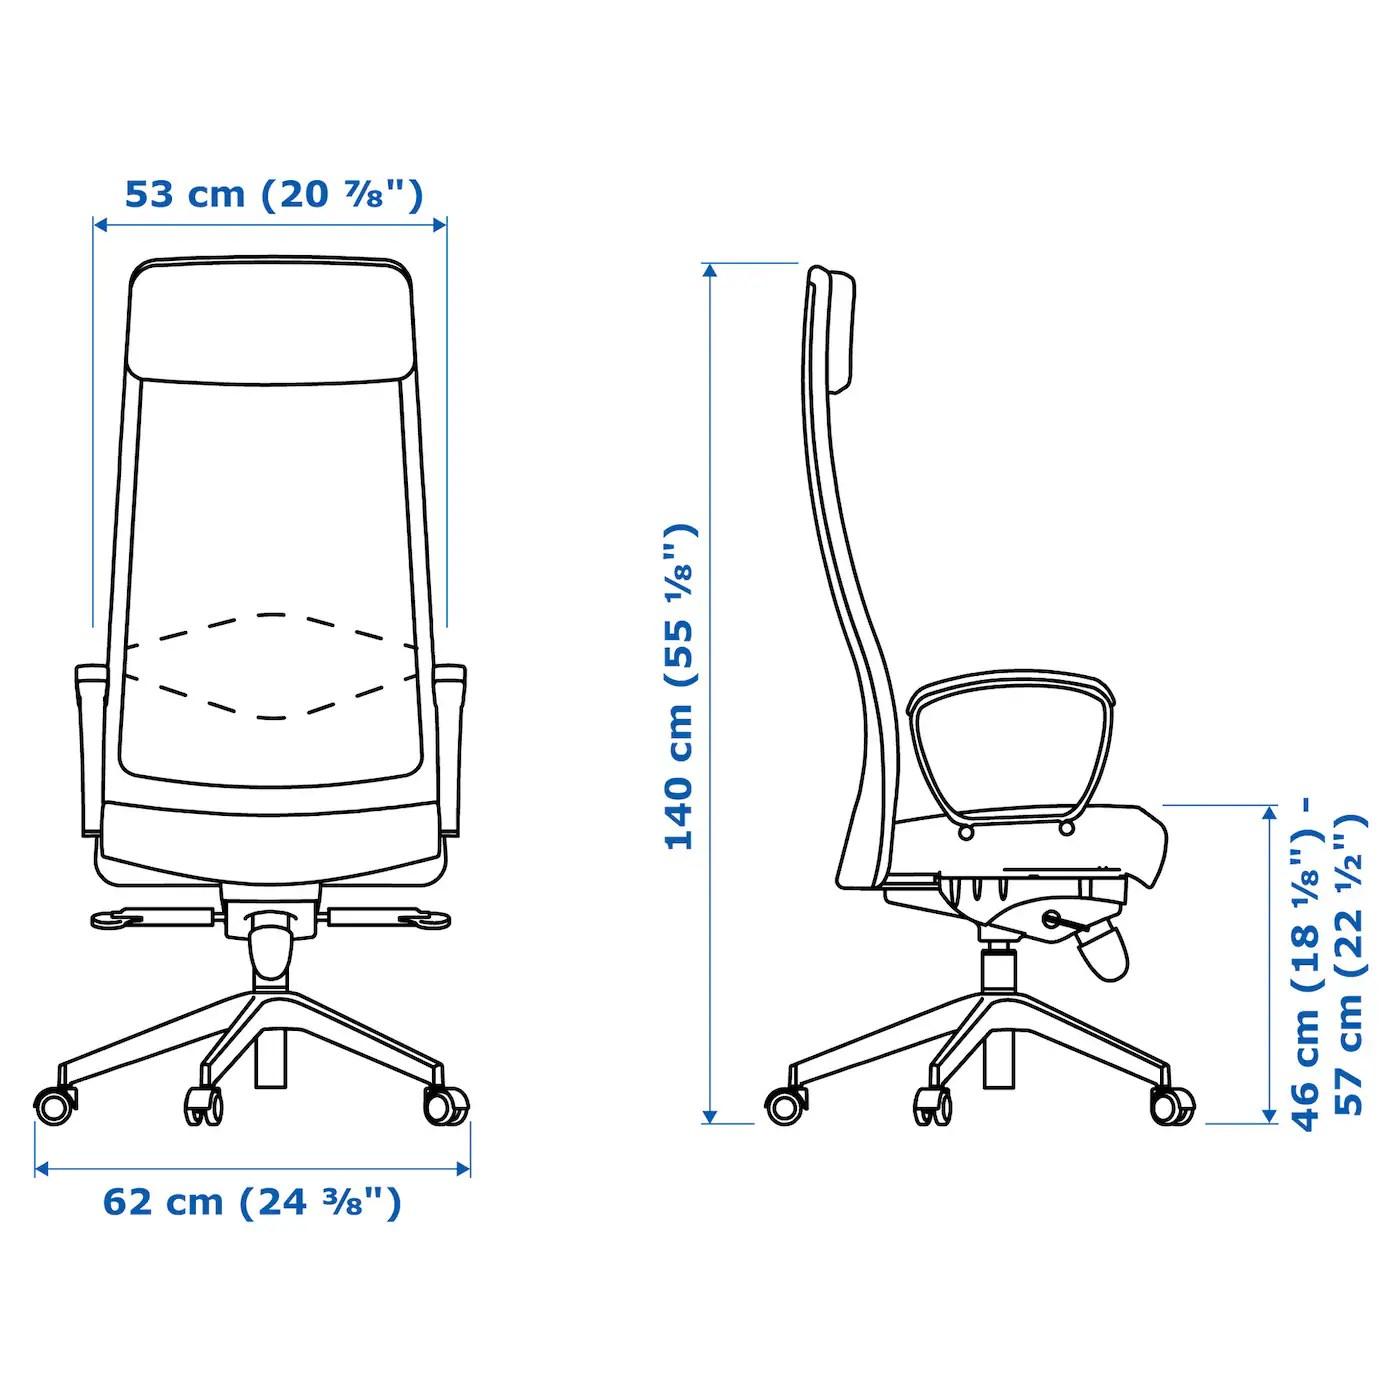 ergonomic chair dimensions pier one imports slipcovers markus swivel glose black ikea